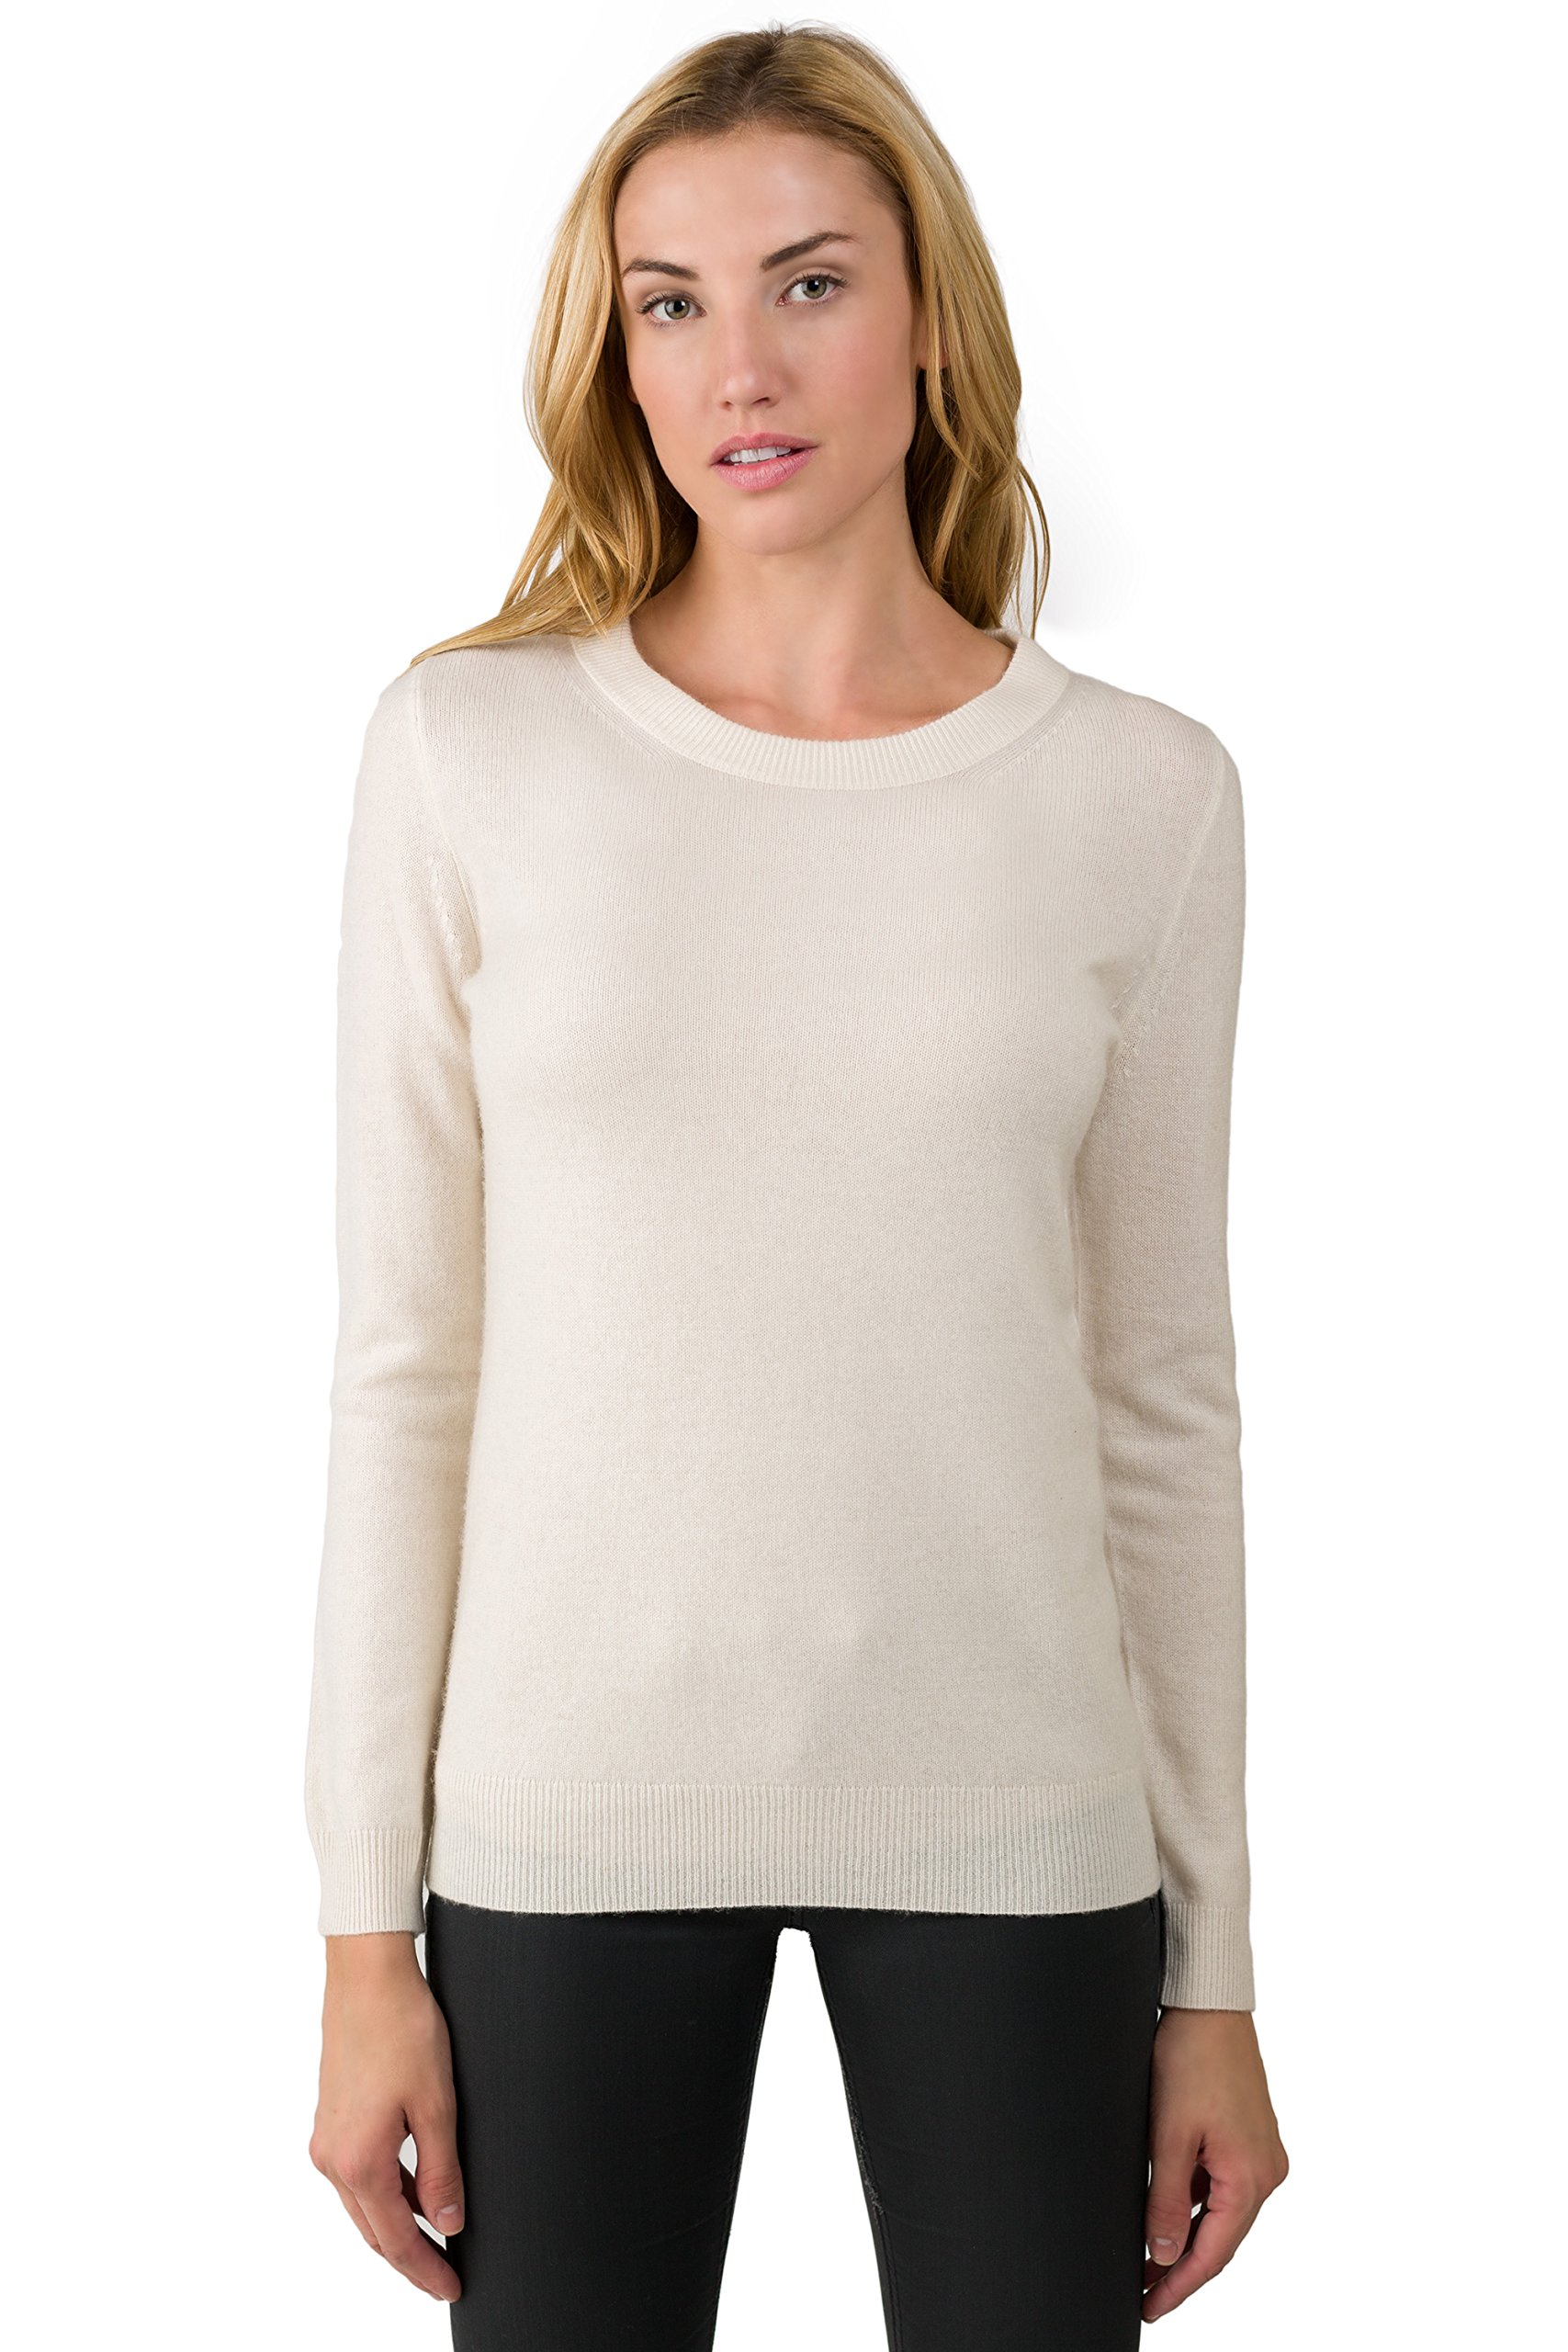 JENNIE LIU Women's 100% Pure Cashmere Long Sleeve Crew Neck Sweater (2X, Cream£